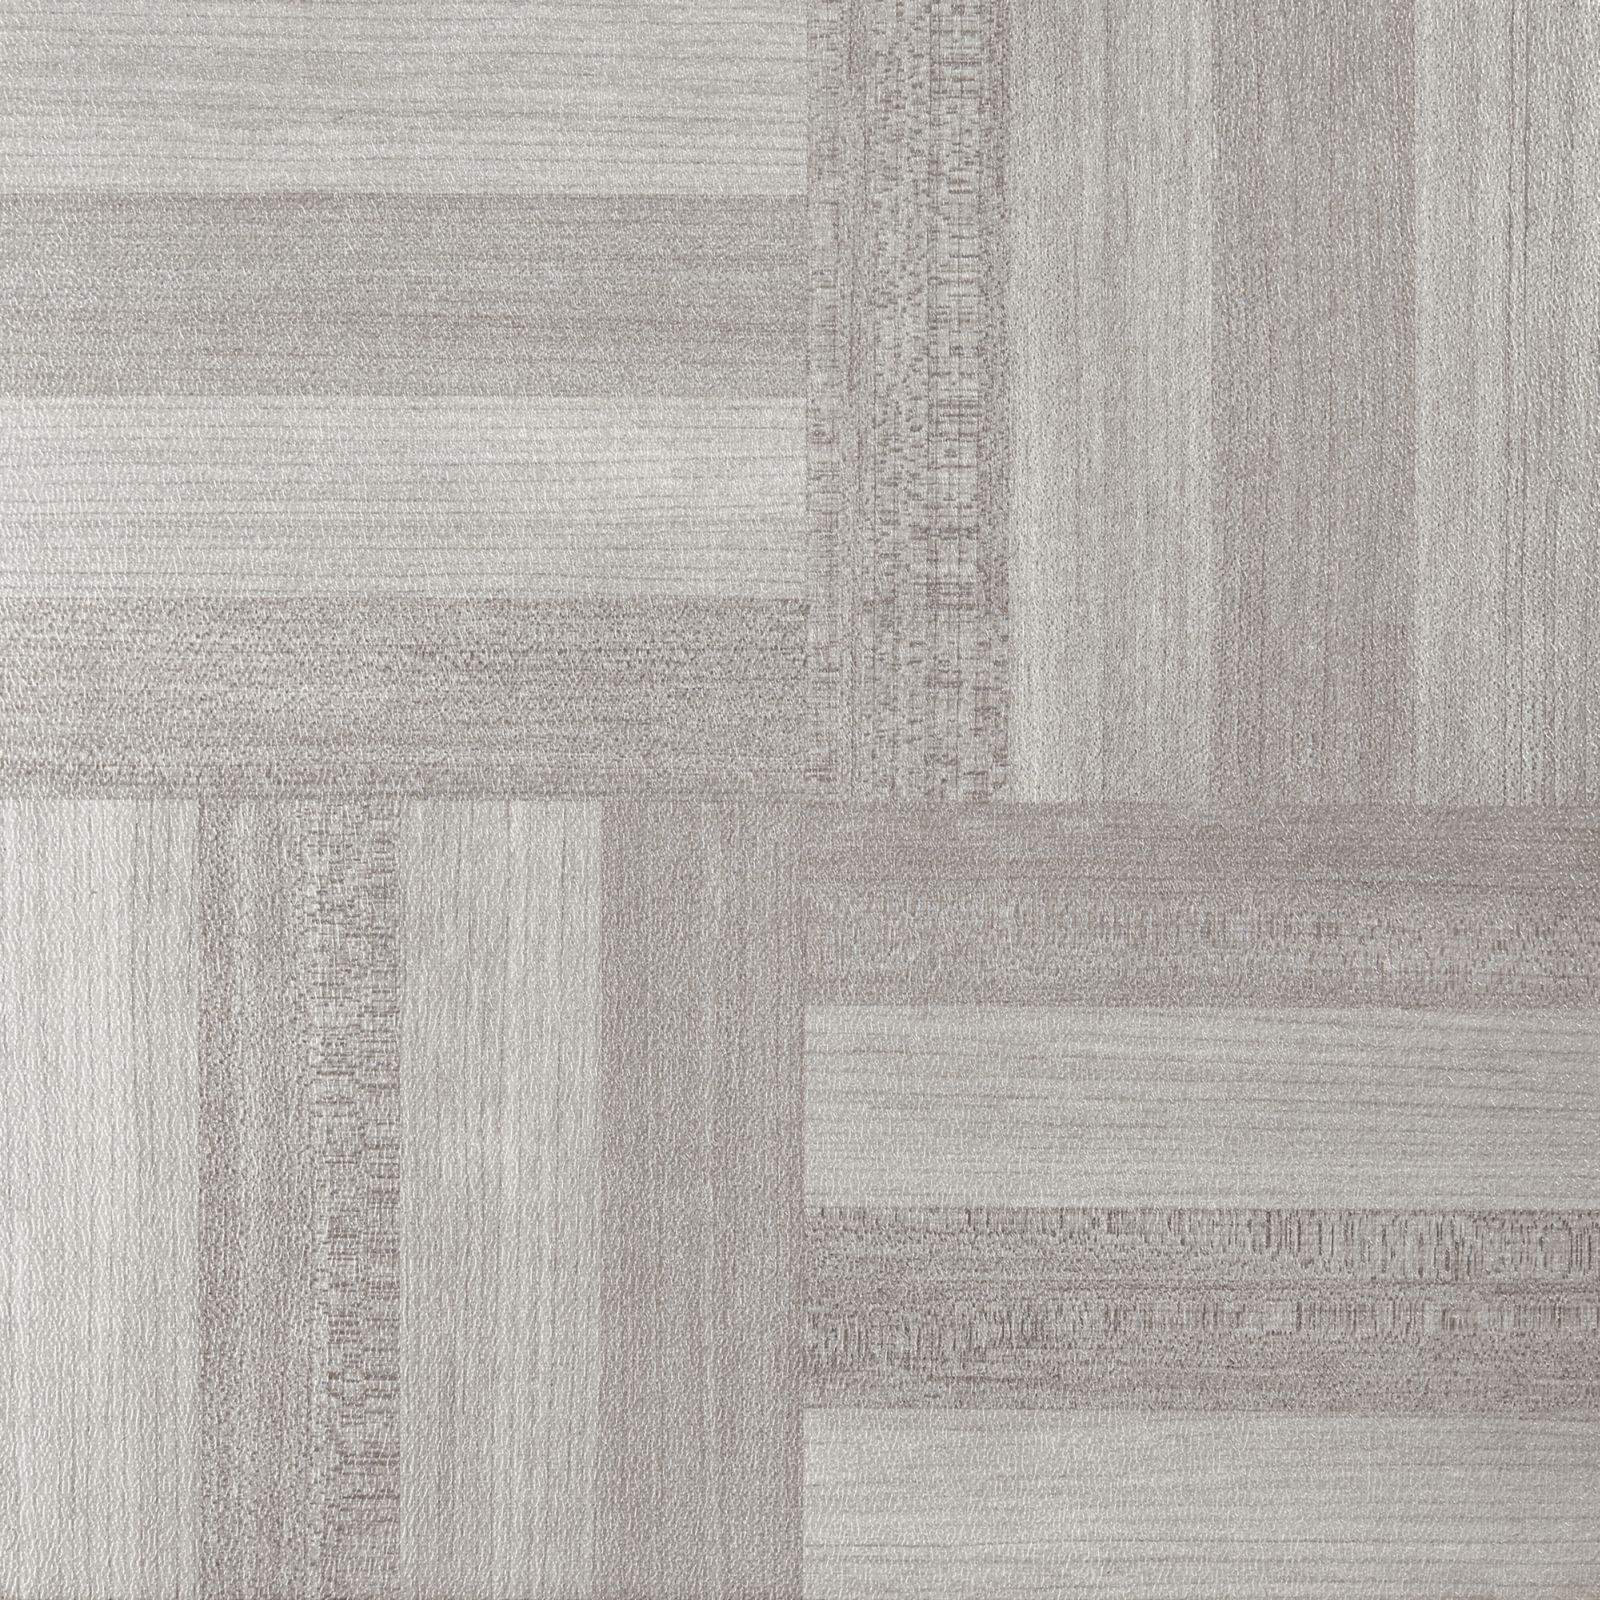 Amazing 1 X 1 Ceiling Tiles Tiny 12X12 Floor Tile Rectangular 2X2 Ceiling Tiles 2X2 Ceramic Floor Tile Old 3 X 6 White Subway Tile Pink3X6 Ceramic Tile ACHIM Nexus Ash Grey Wood Grain Vinyl 12 Inch X 12 Inch Self ..